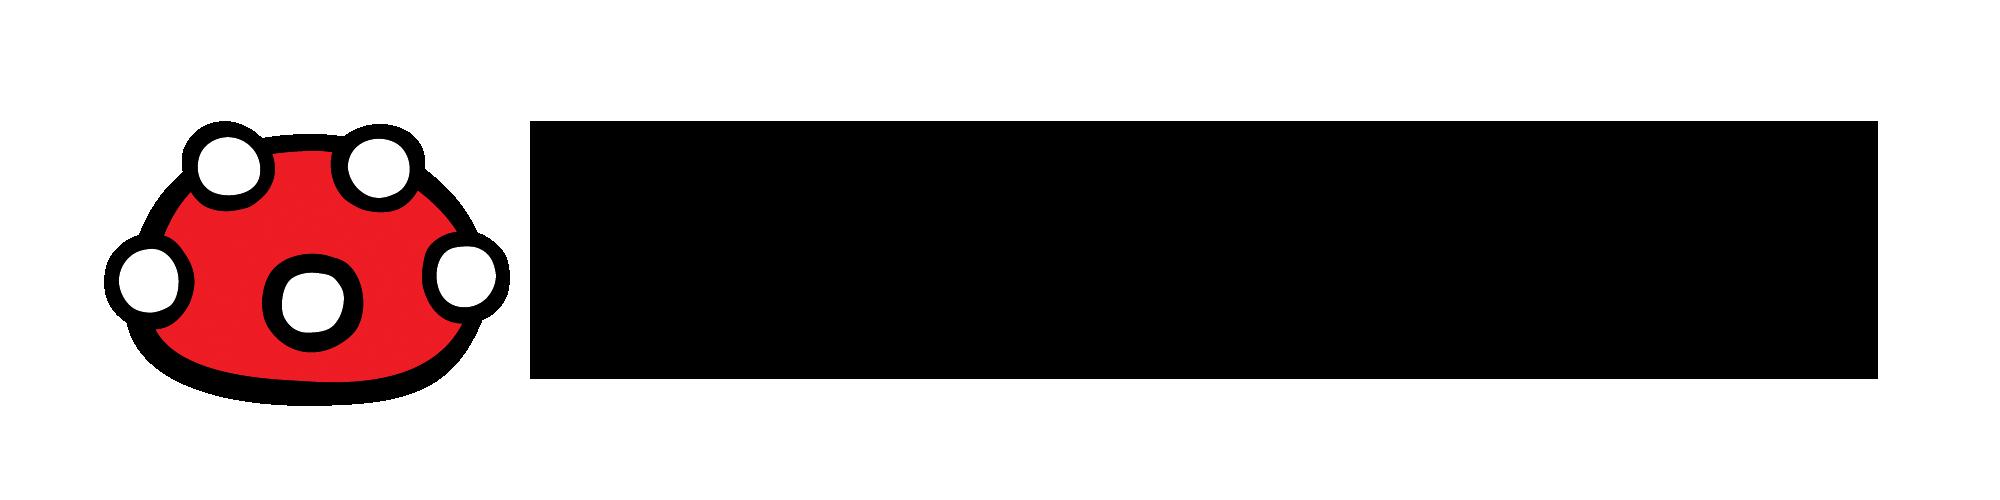 http://upload.wikimedia.org/wikipedia/fr/d/d6/Amanita_Design_Logo.png